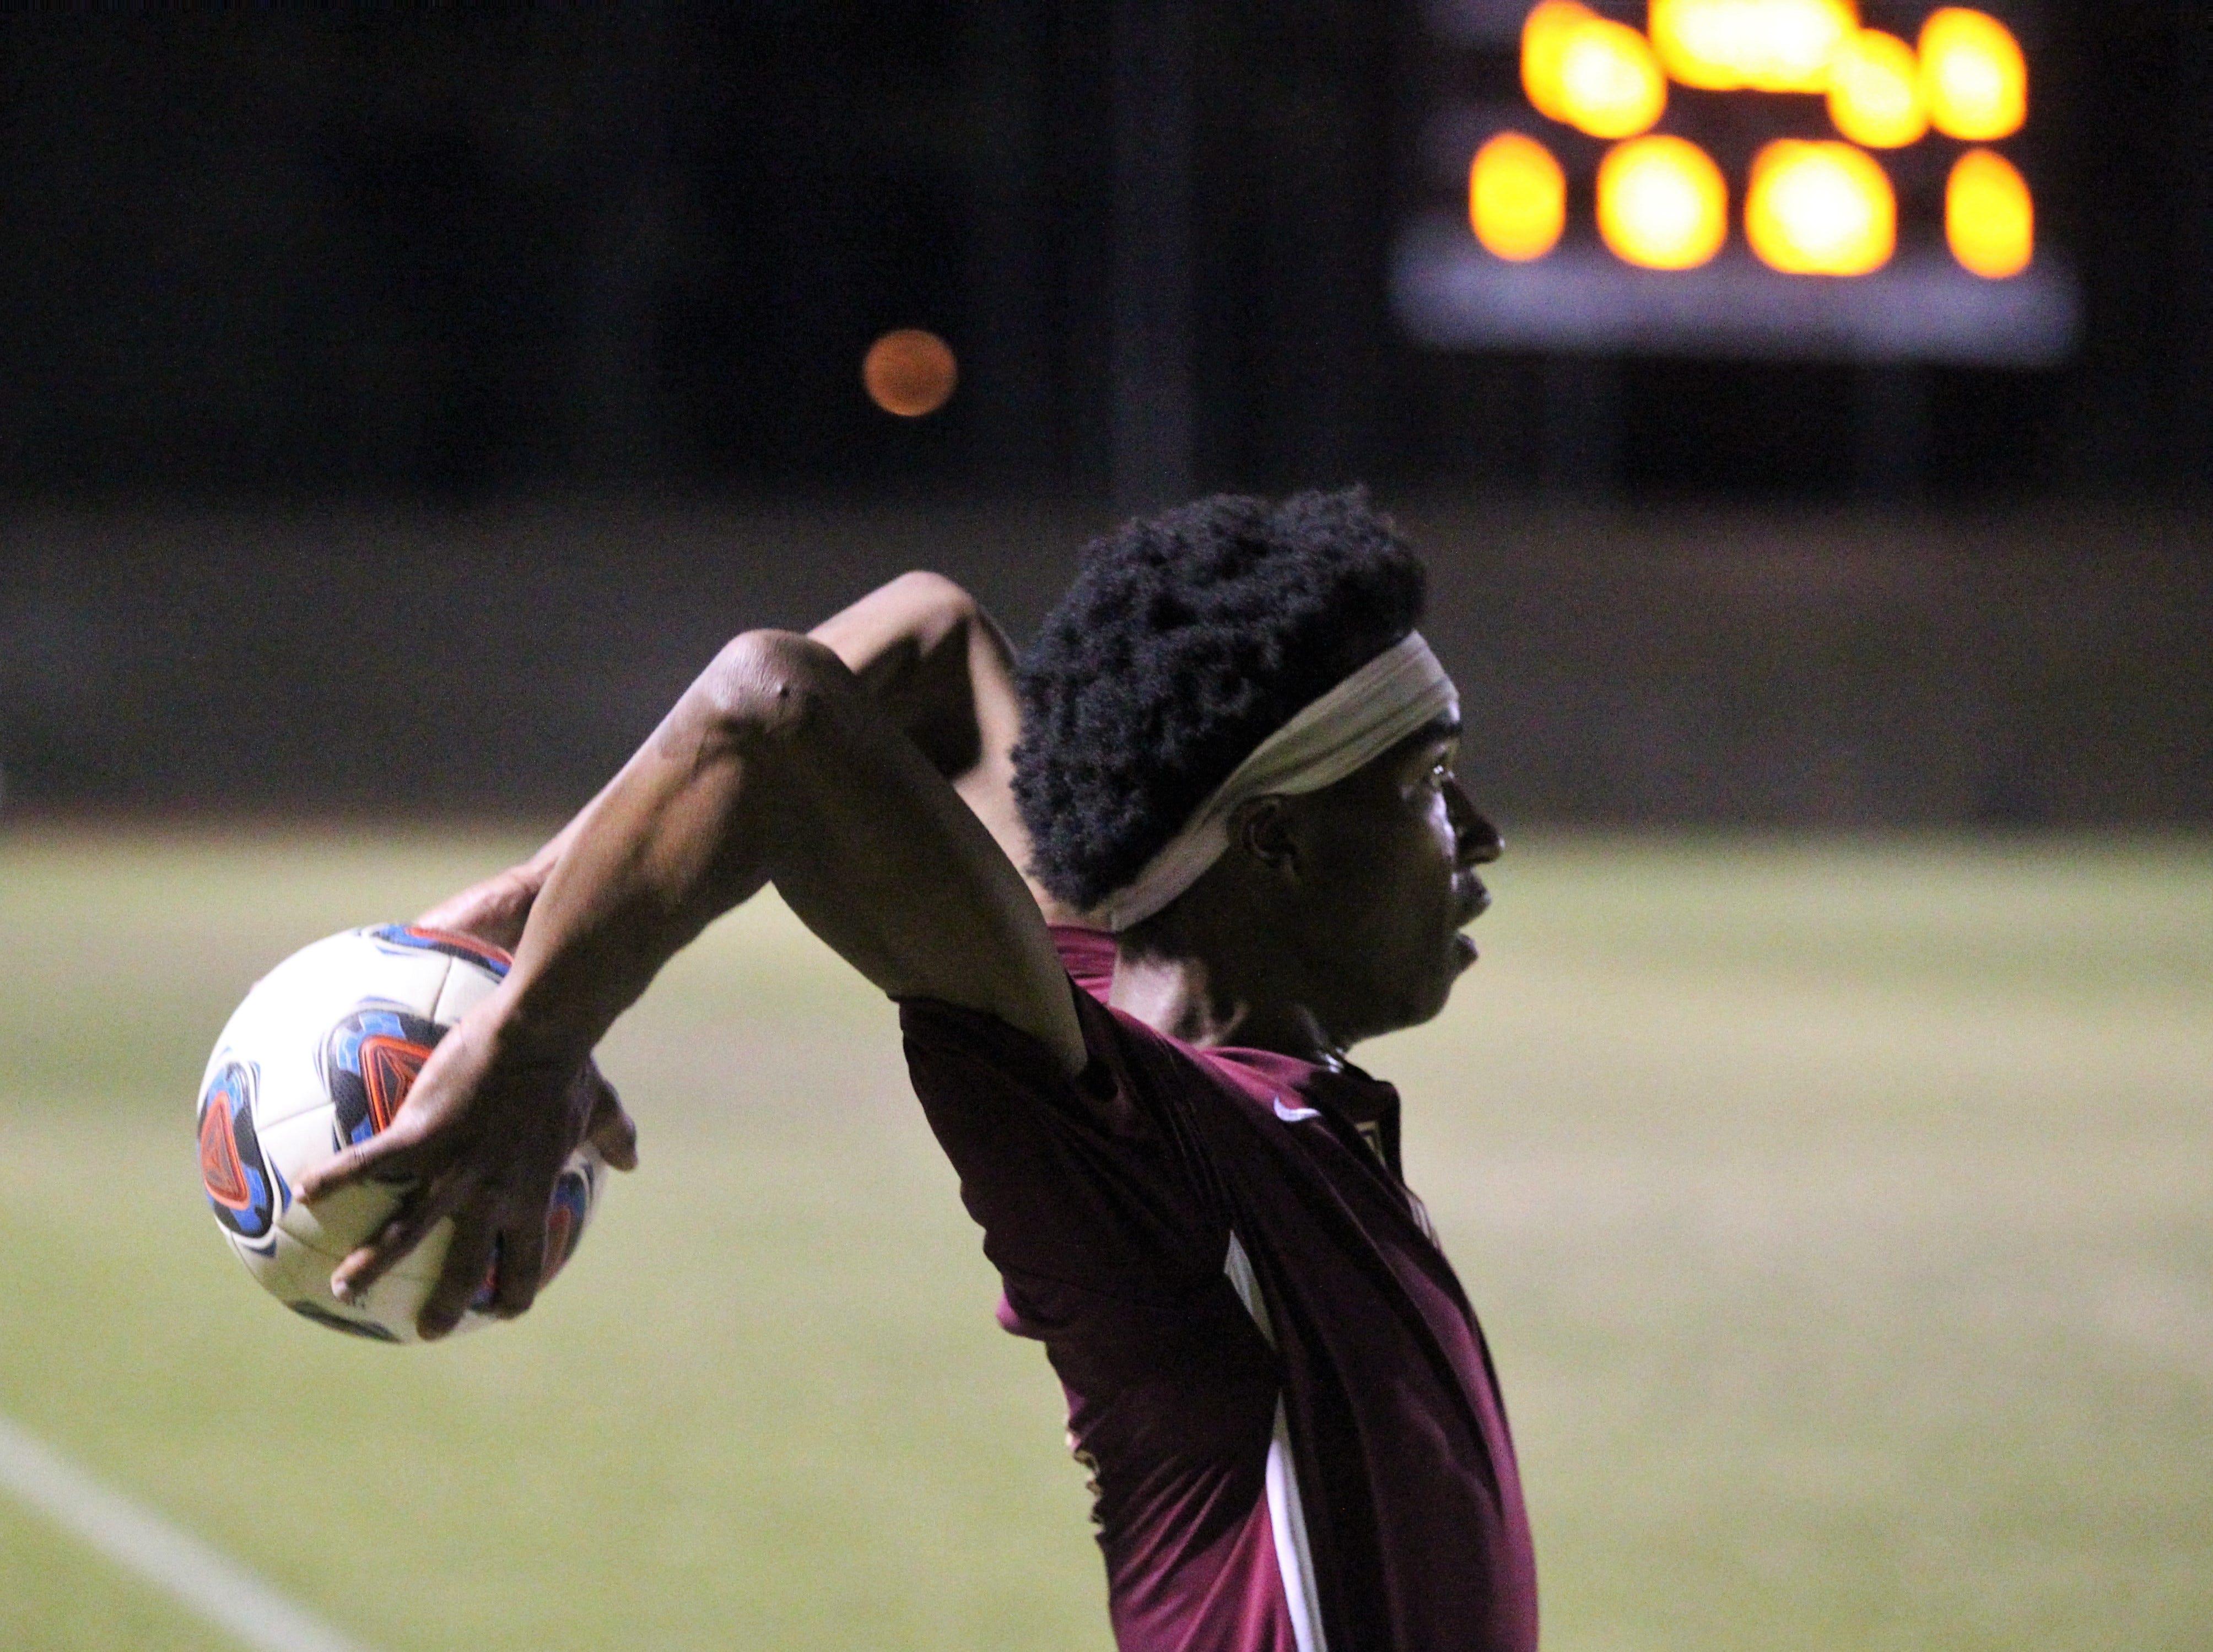 Florida High's Burnic Jordan makes a throw-in as Florida High's boys soccer team beat South Walton 2-0 during a Region 1-2A quarterfinal on Feb. 6, 2018.